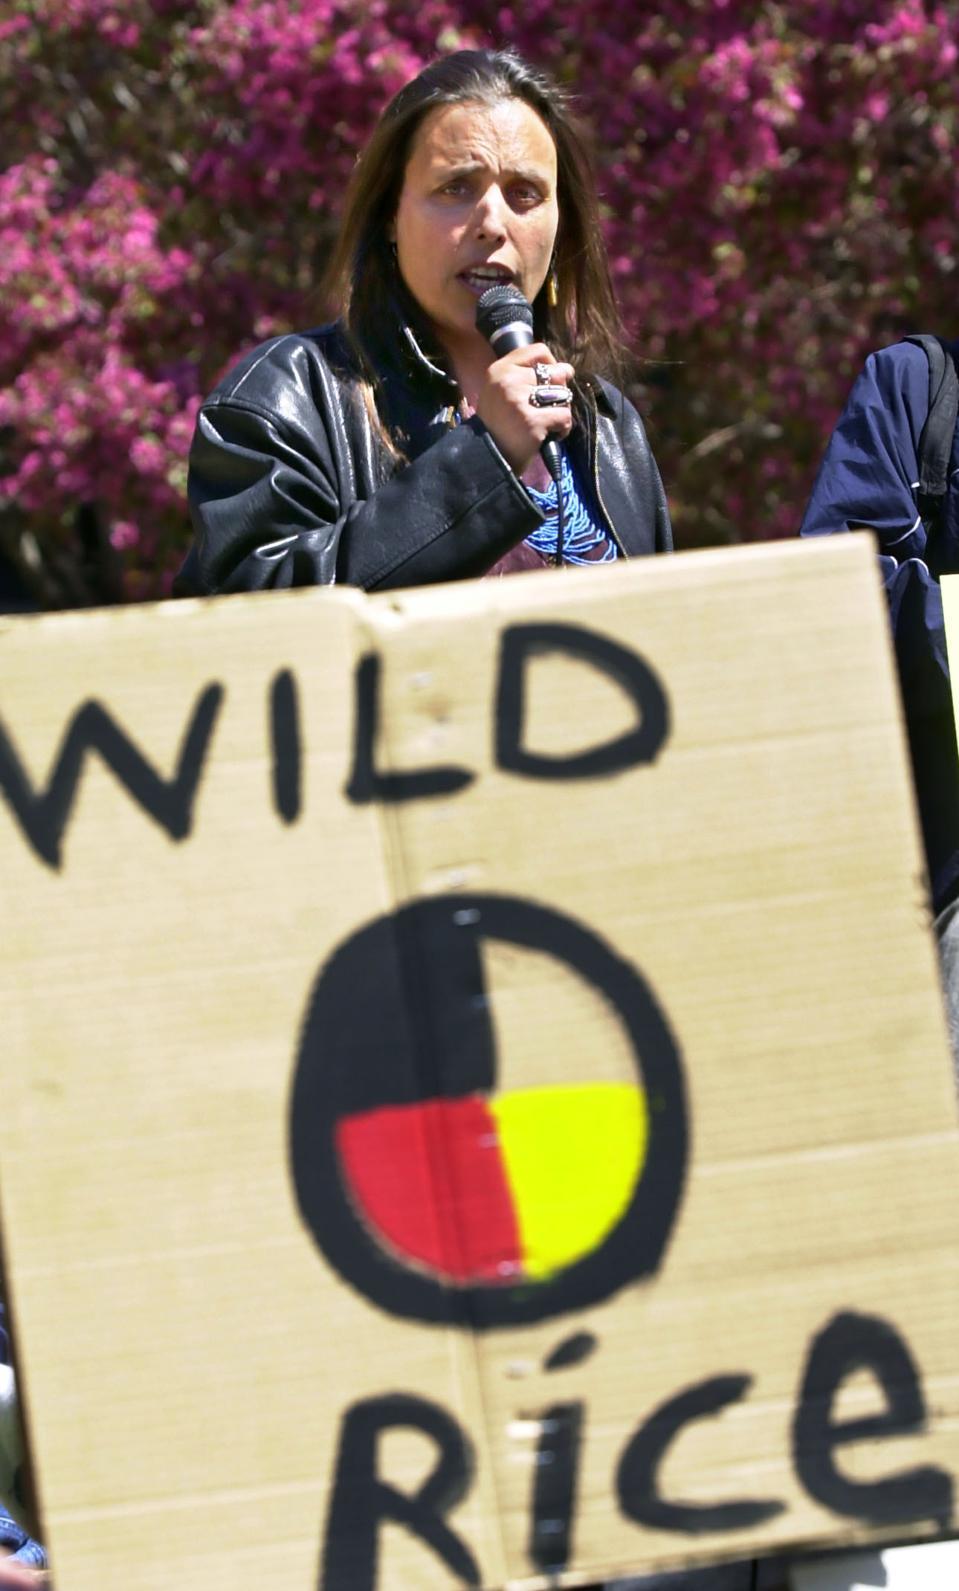 Winona LaDuke protesting genetically modified rice.